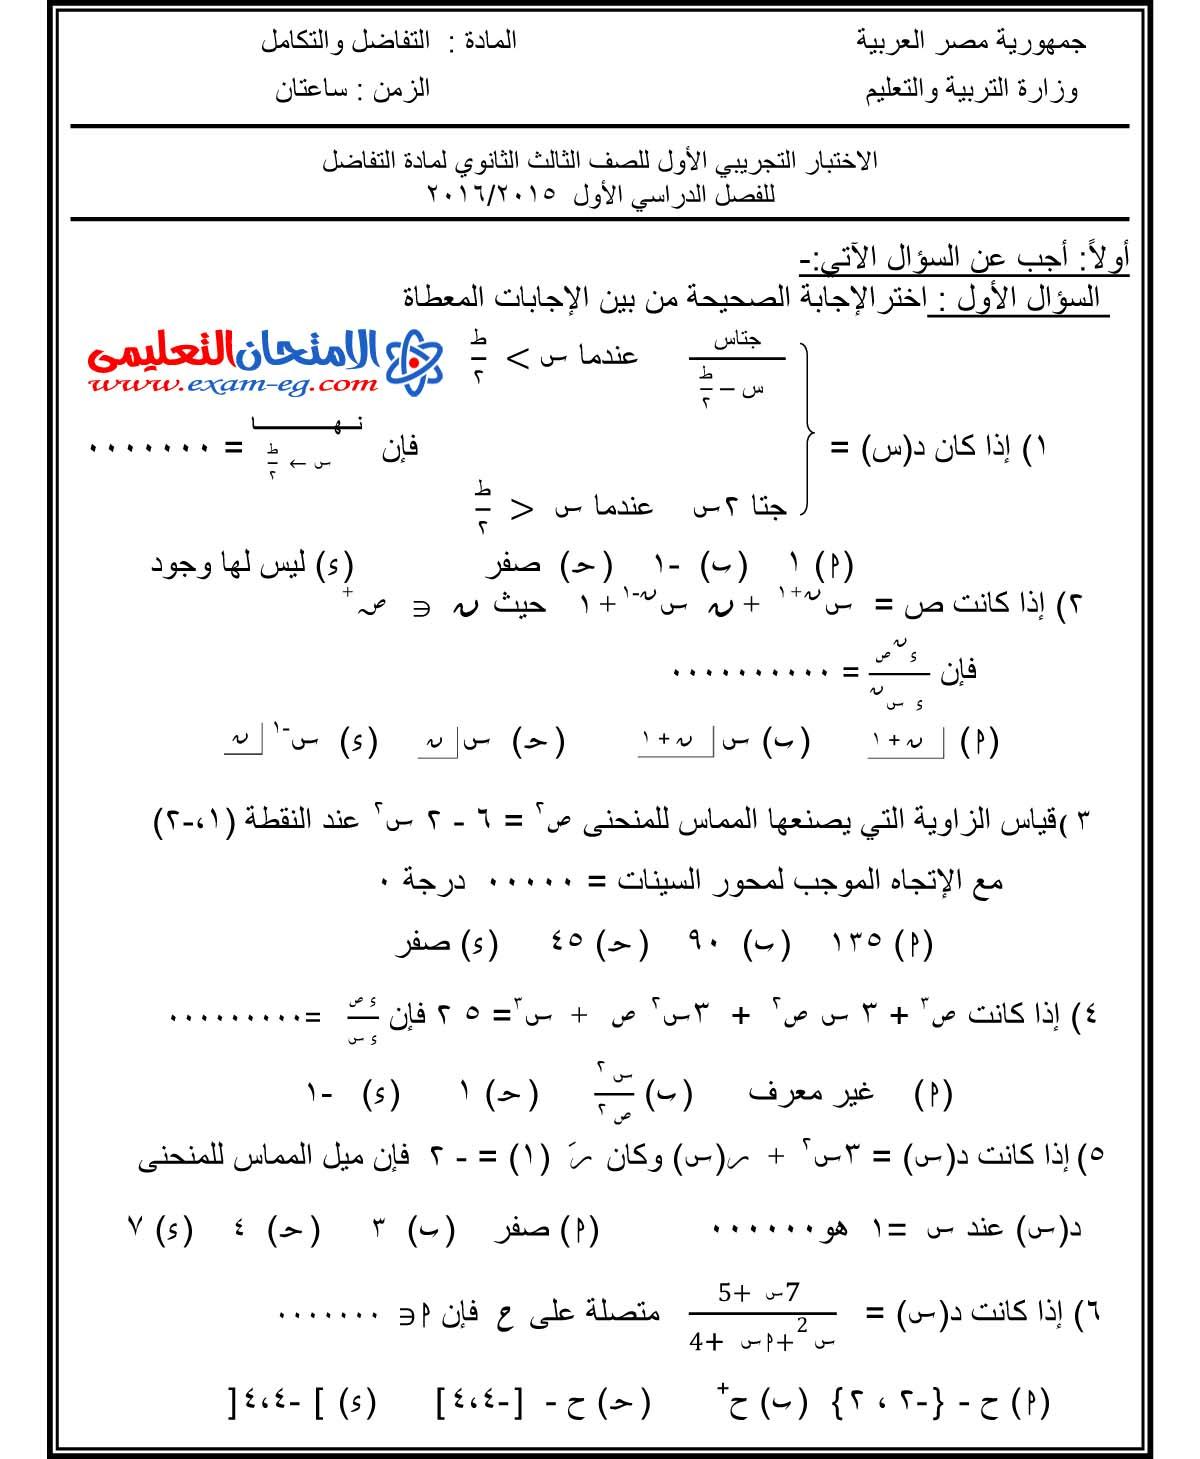 exam-eg.com_1460419970541.jpg